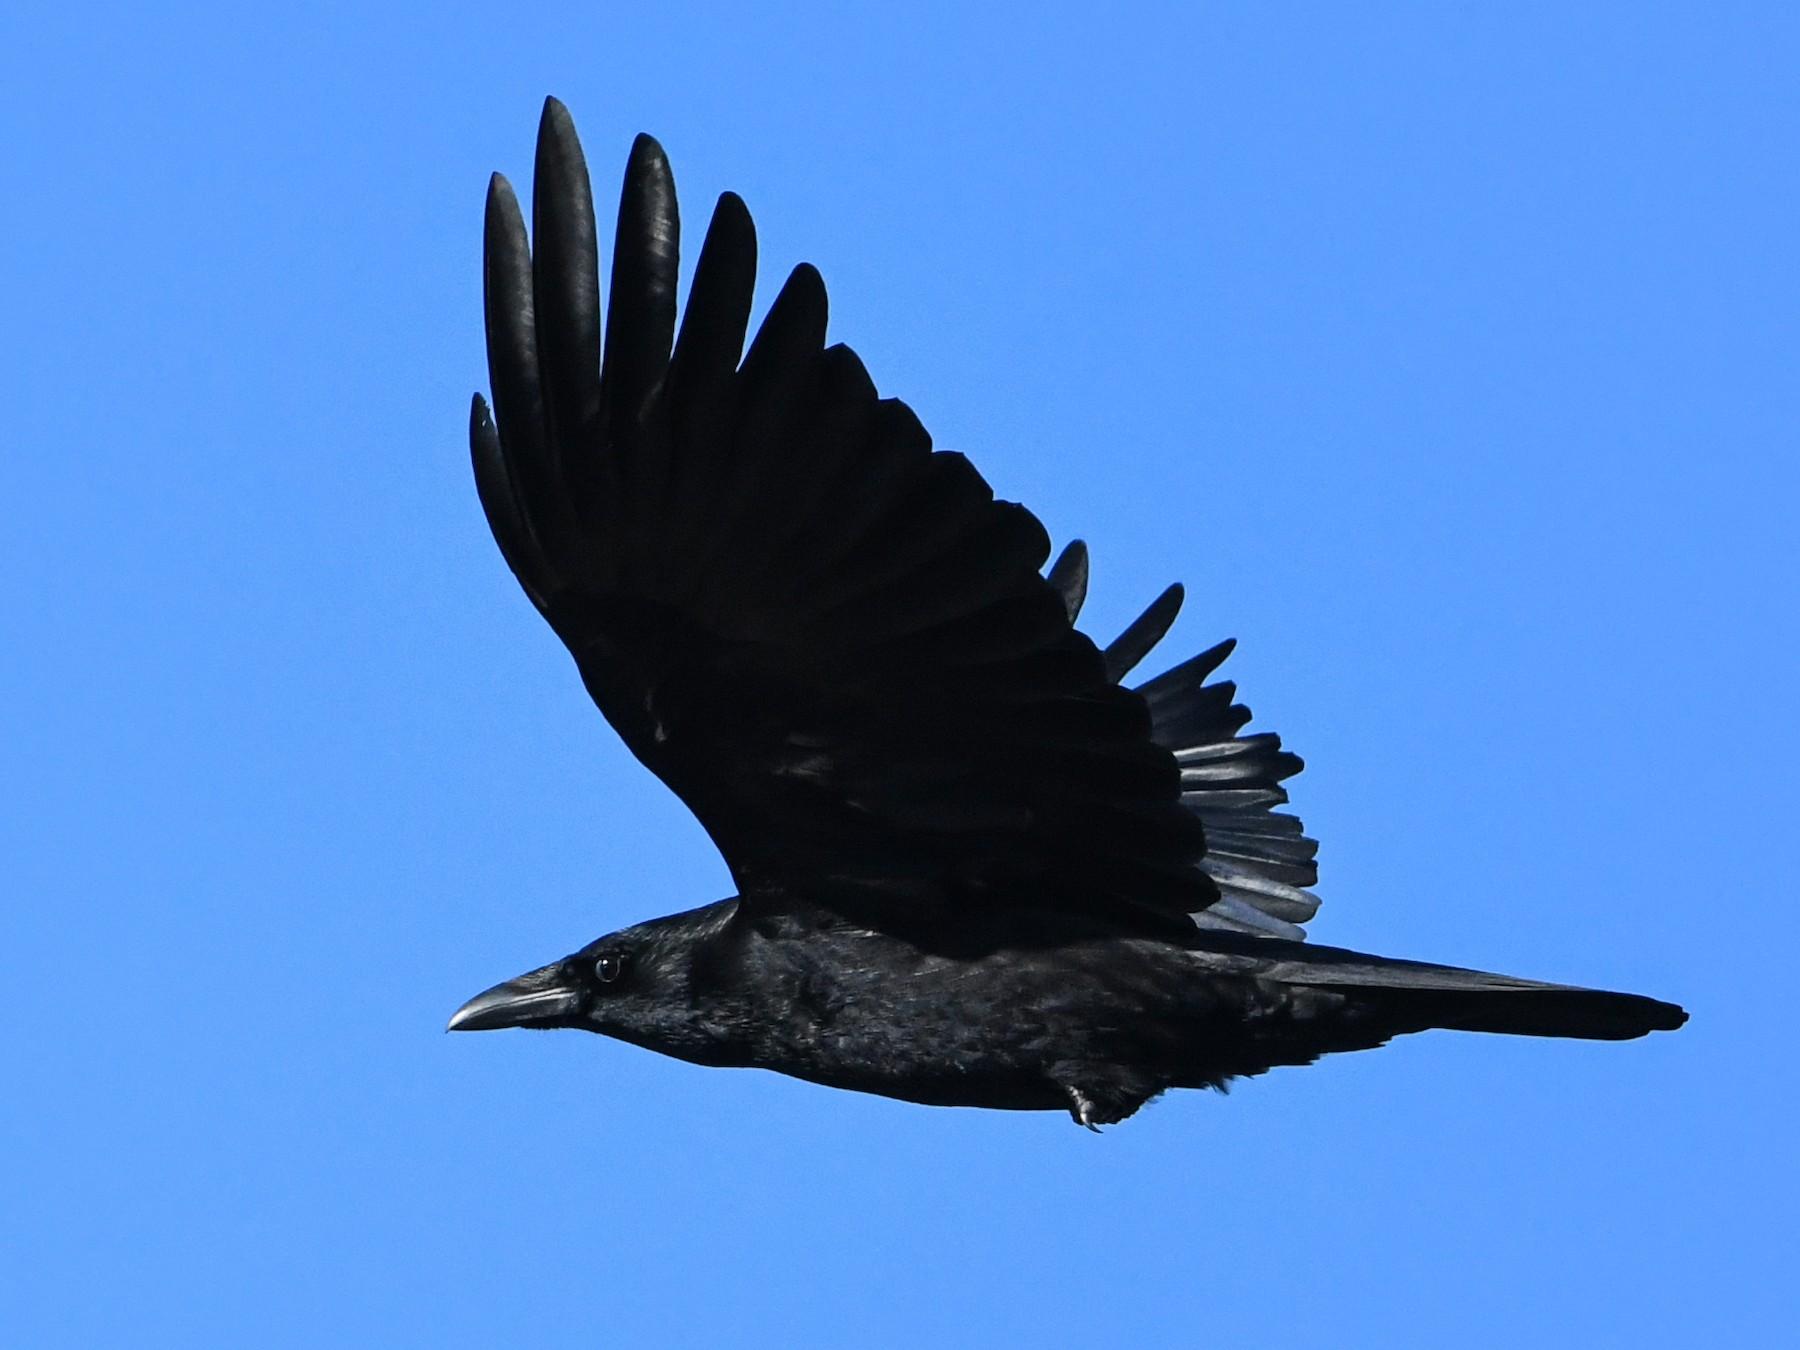 Carrion Crow - Maryse Neukomm